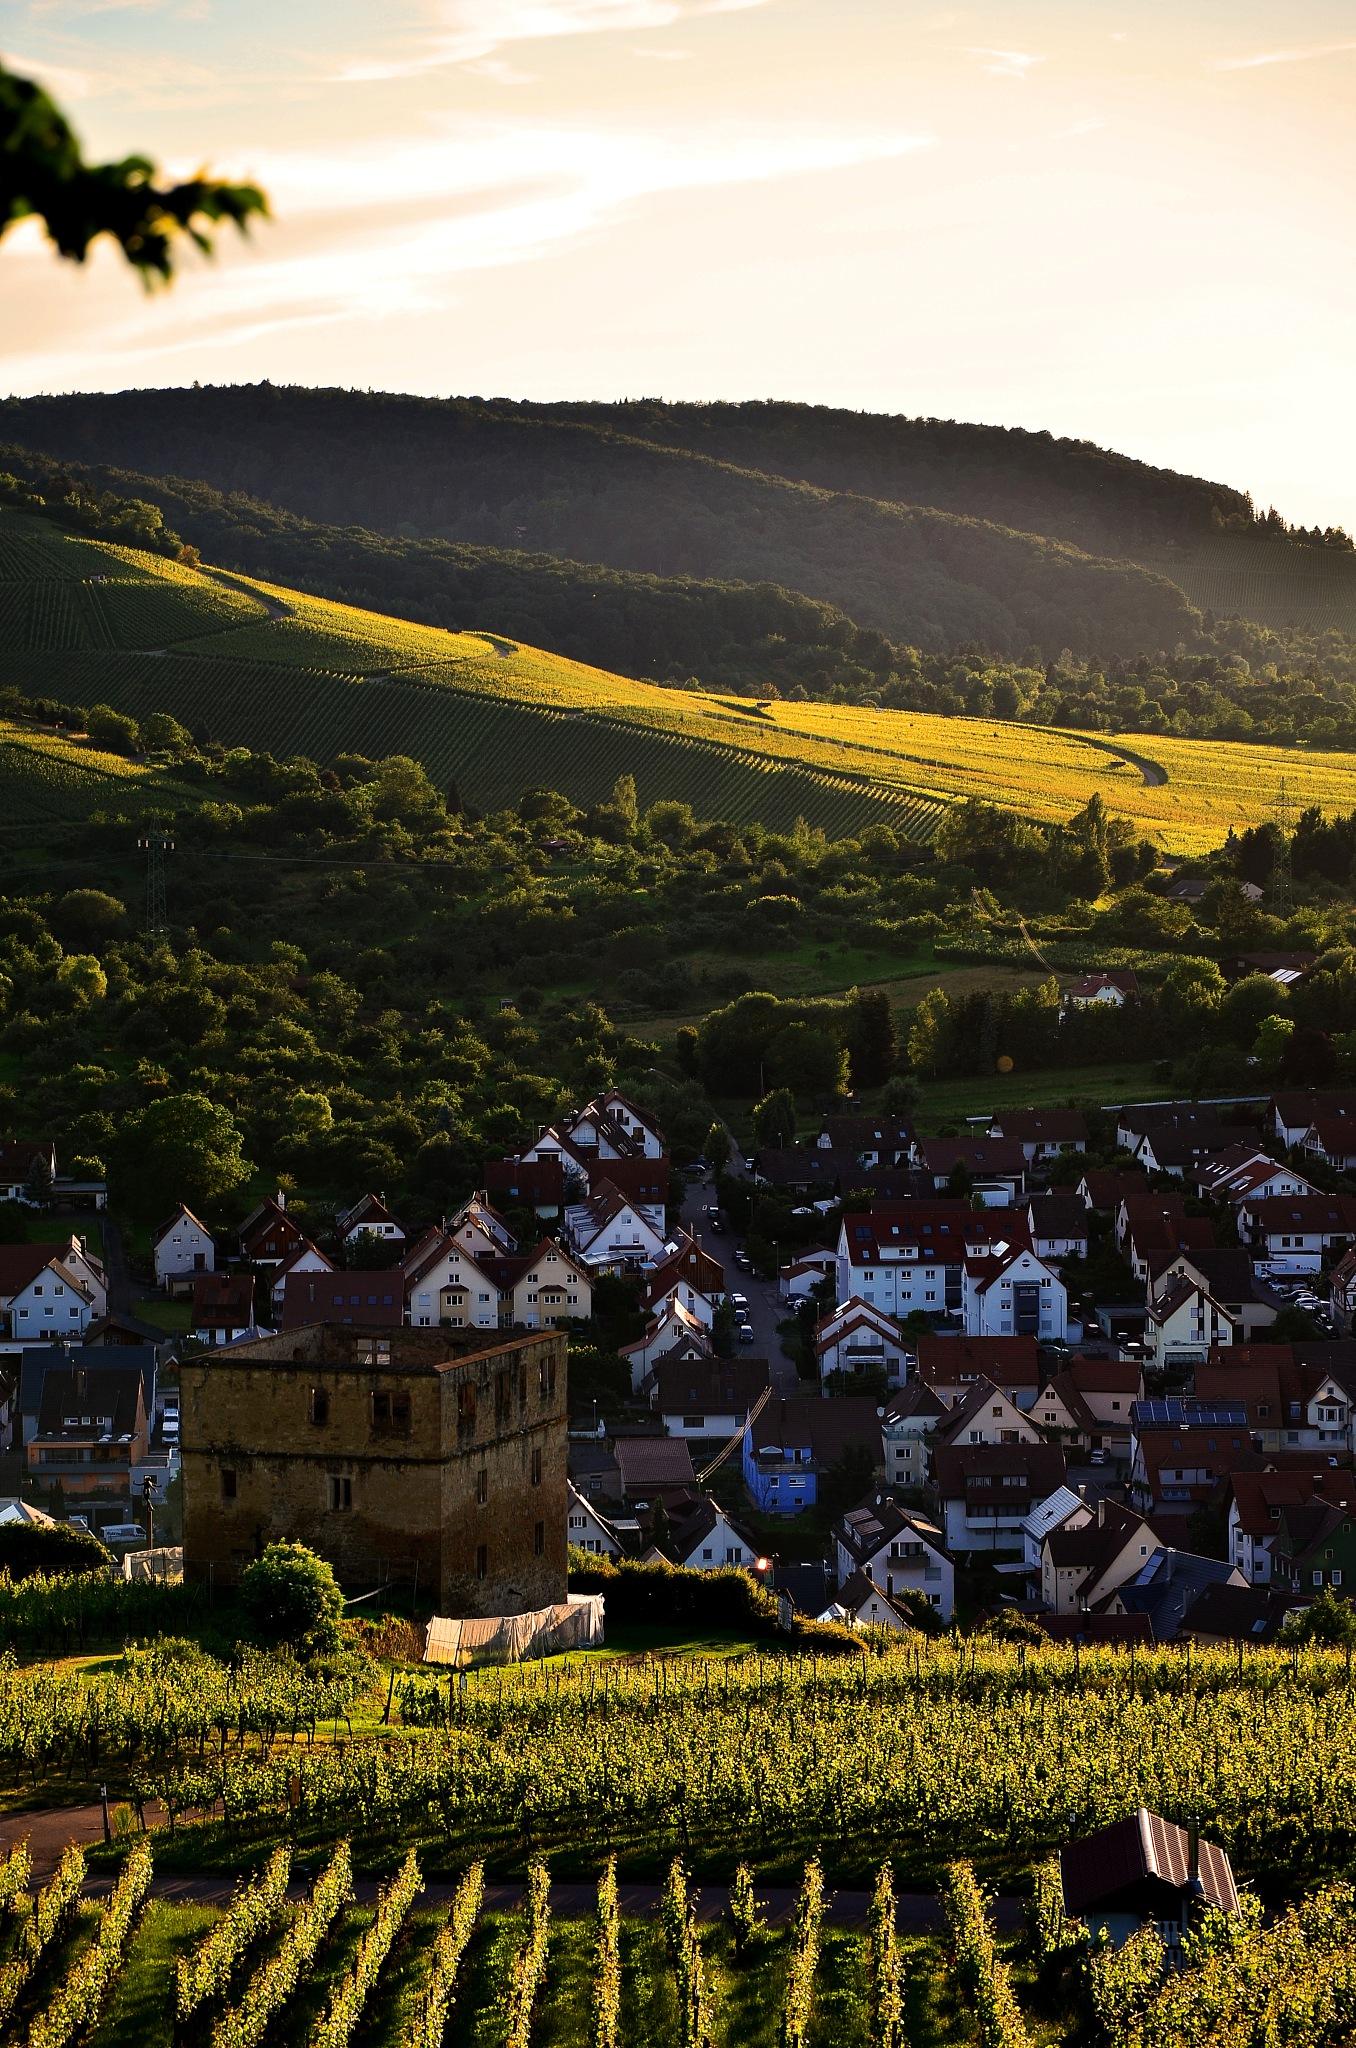 Sunshine & Vineyards by Stoica Emilian